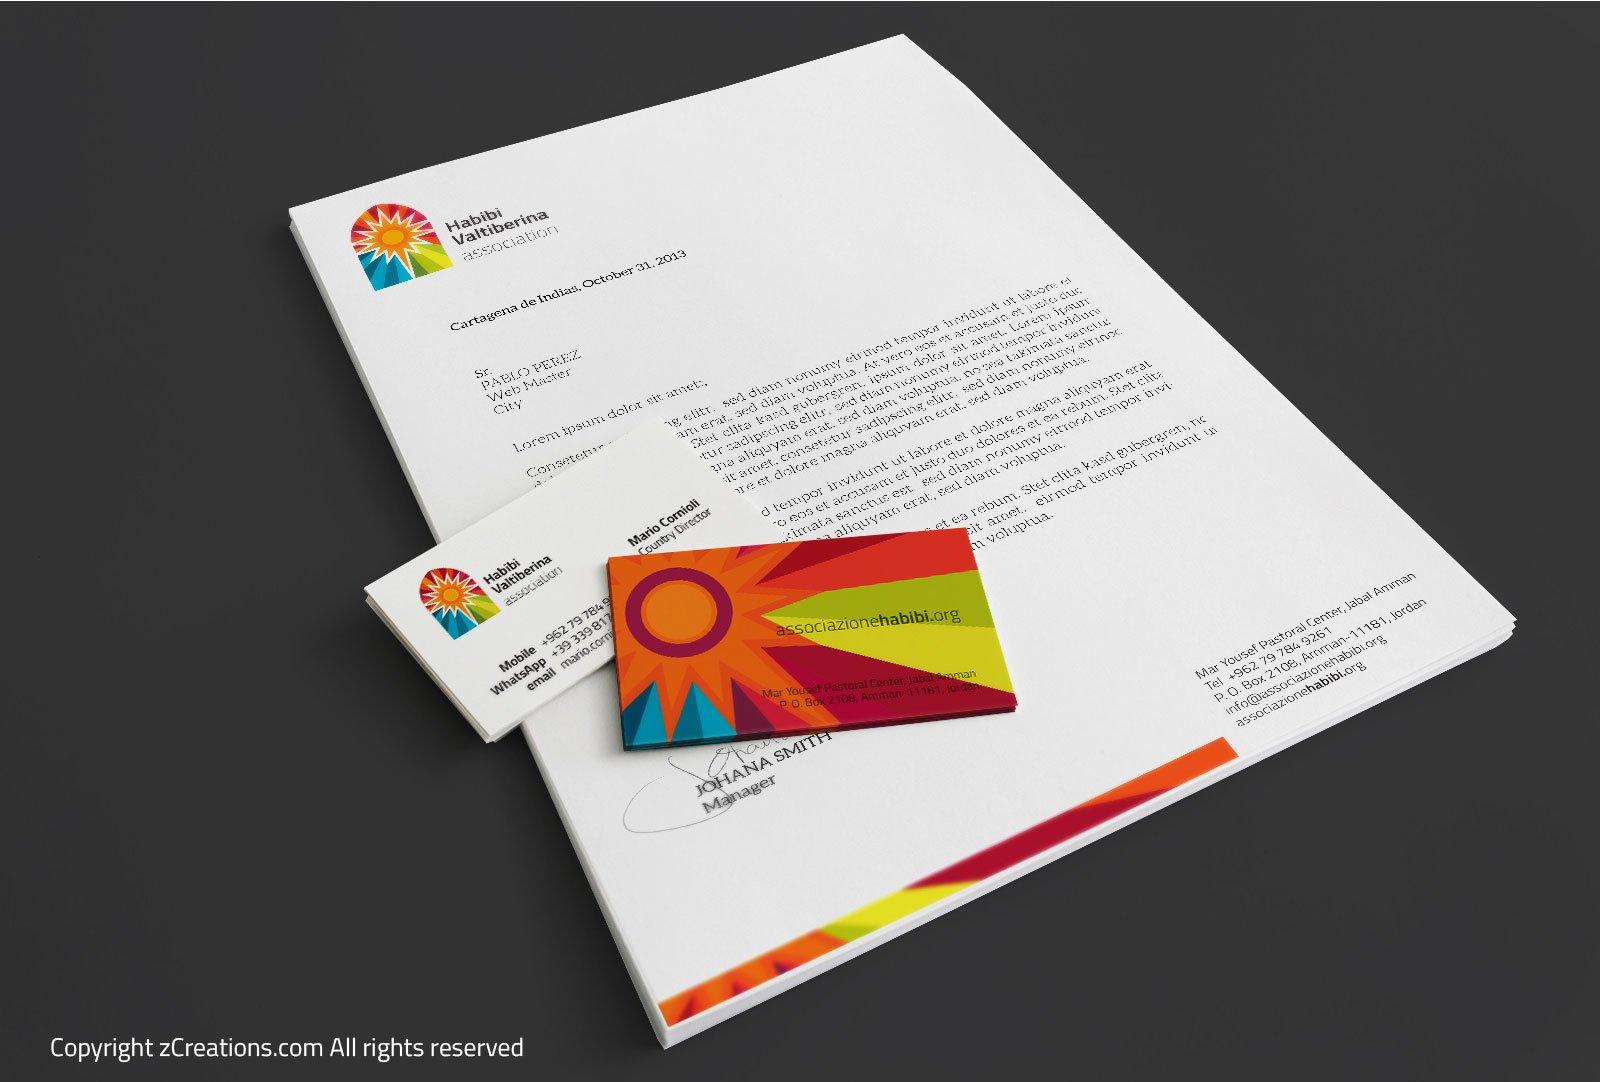 Habibi Valtiberina Logo and branding design by zCreations